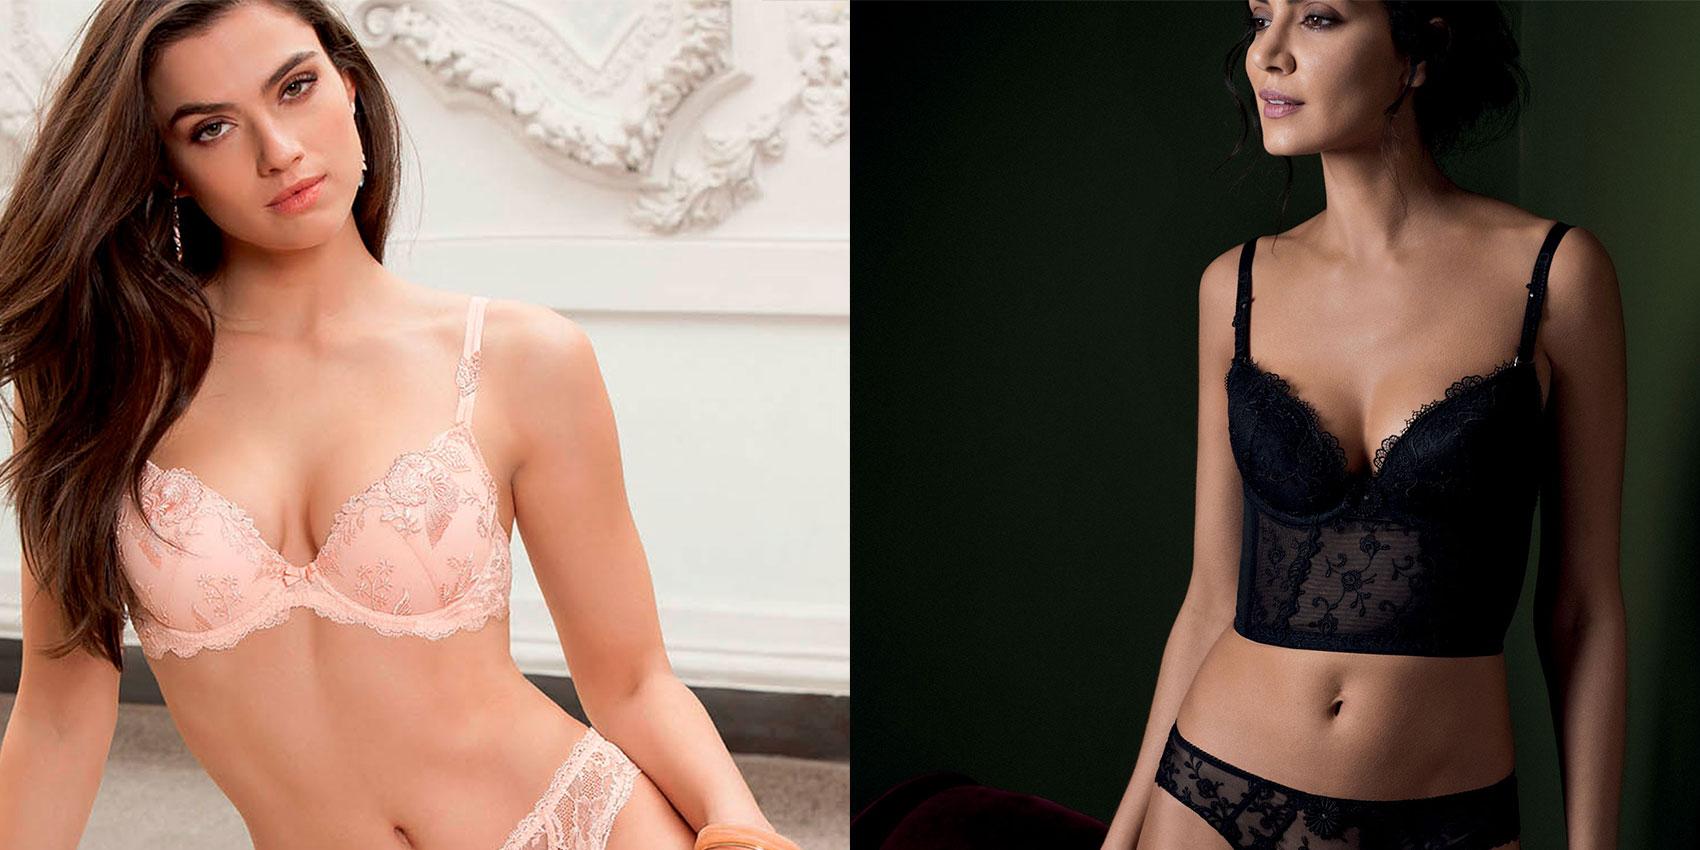 #BrighentiBlog – Regalare lingerie a Natale, l'intrigante pizzo